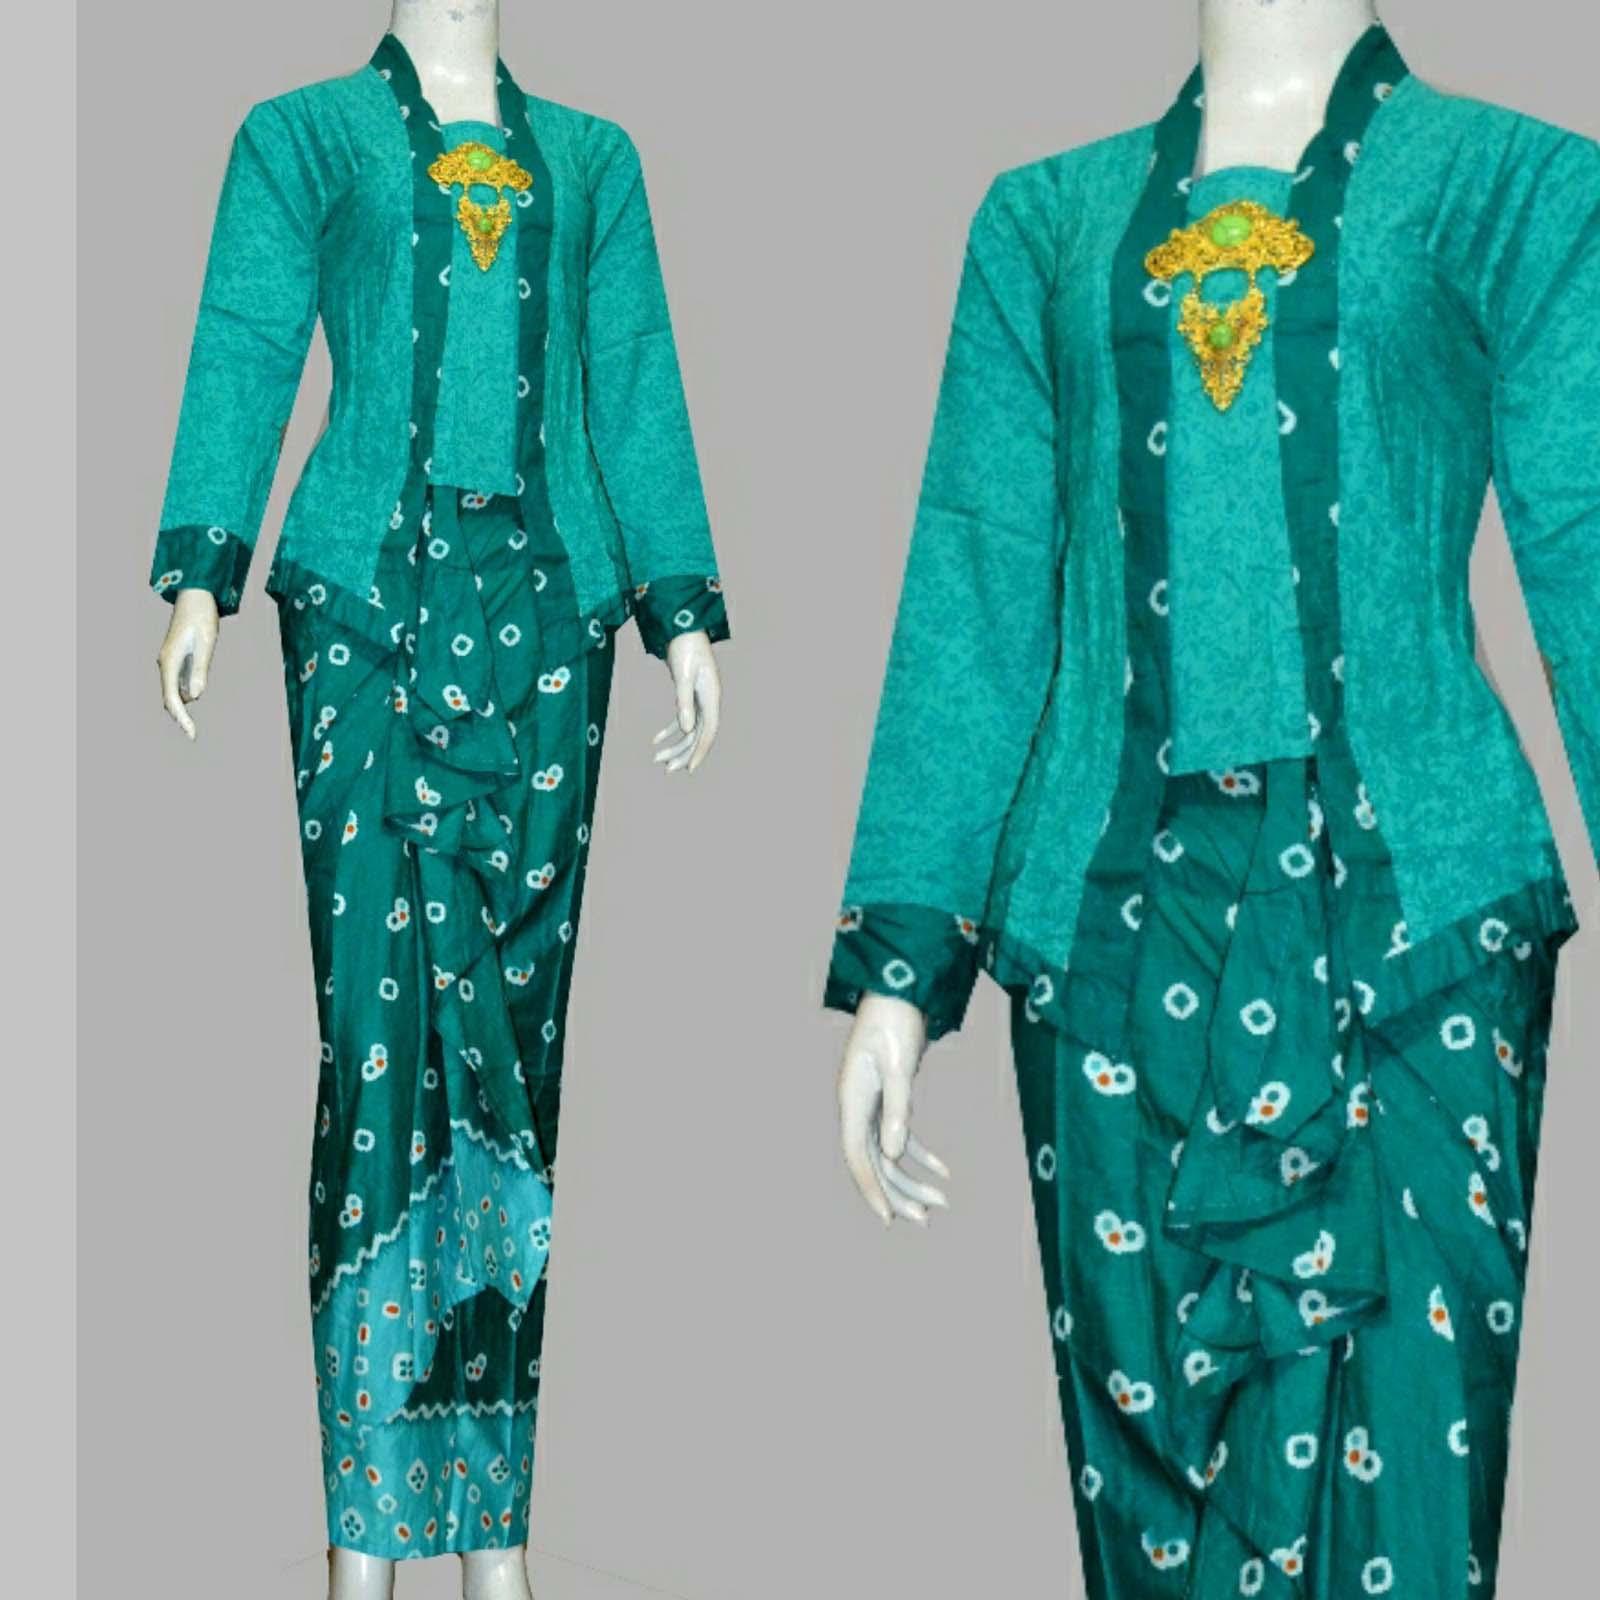 21 Model Baju Batik Kutu Baru Modern Untuk Wanita